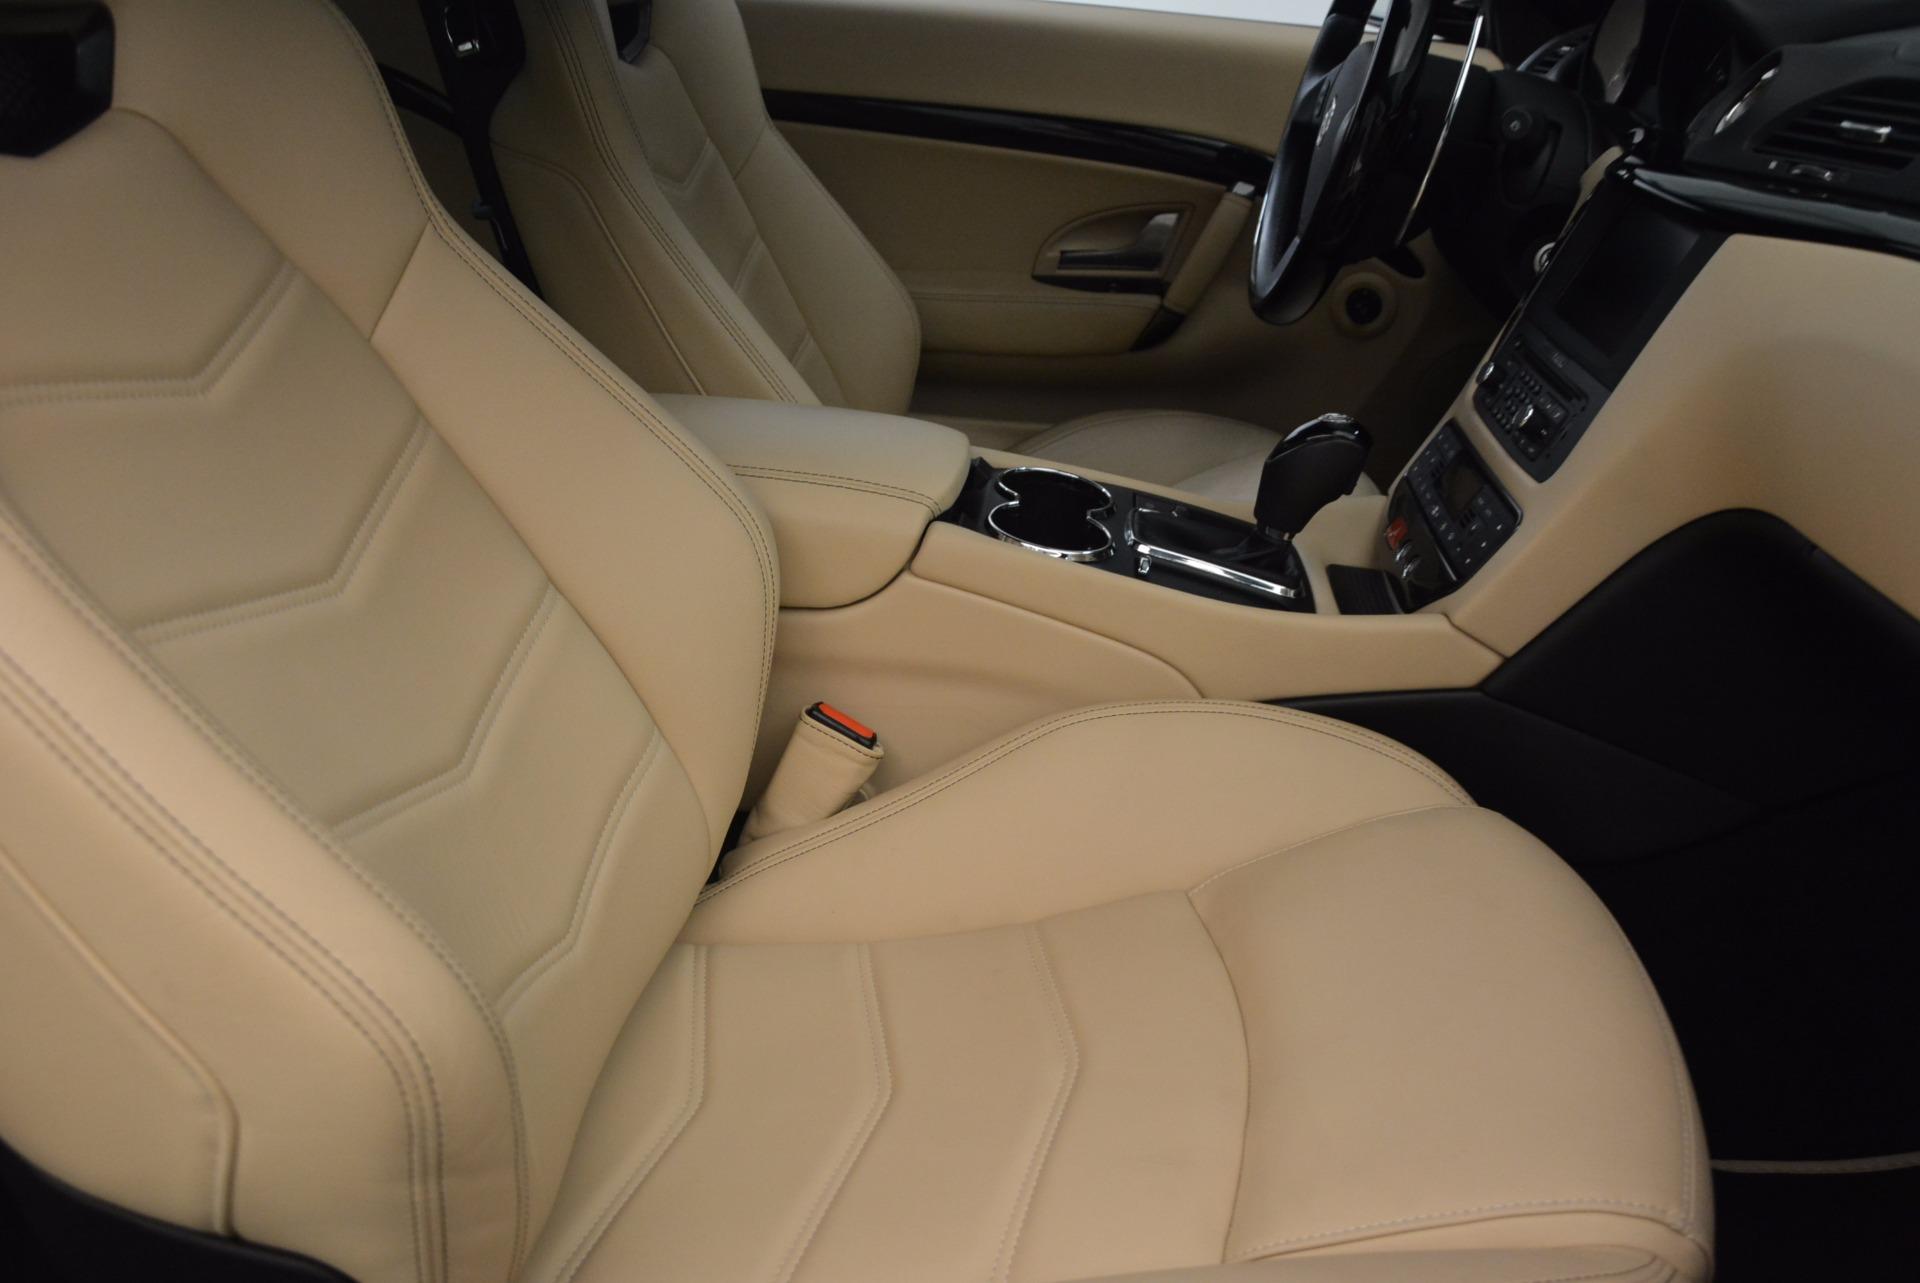 Used 2015 Maserati GranTurismo Sport Coupe For Sale In Westport, CT 1557_p23